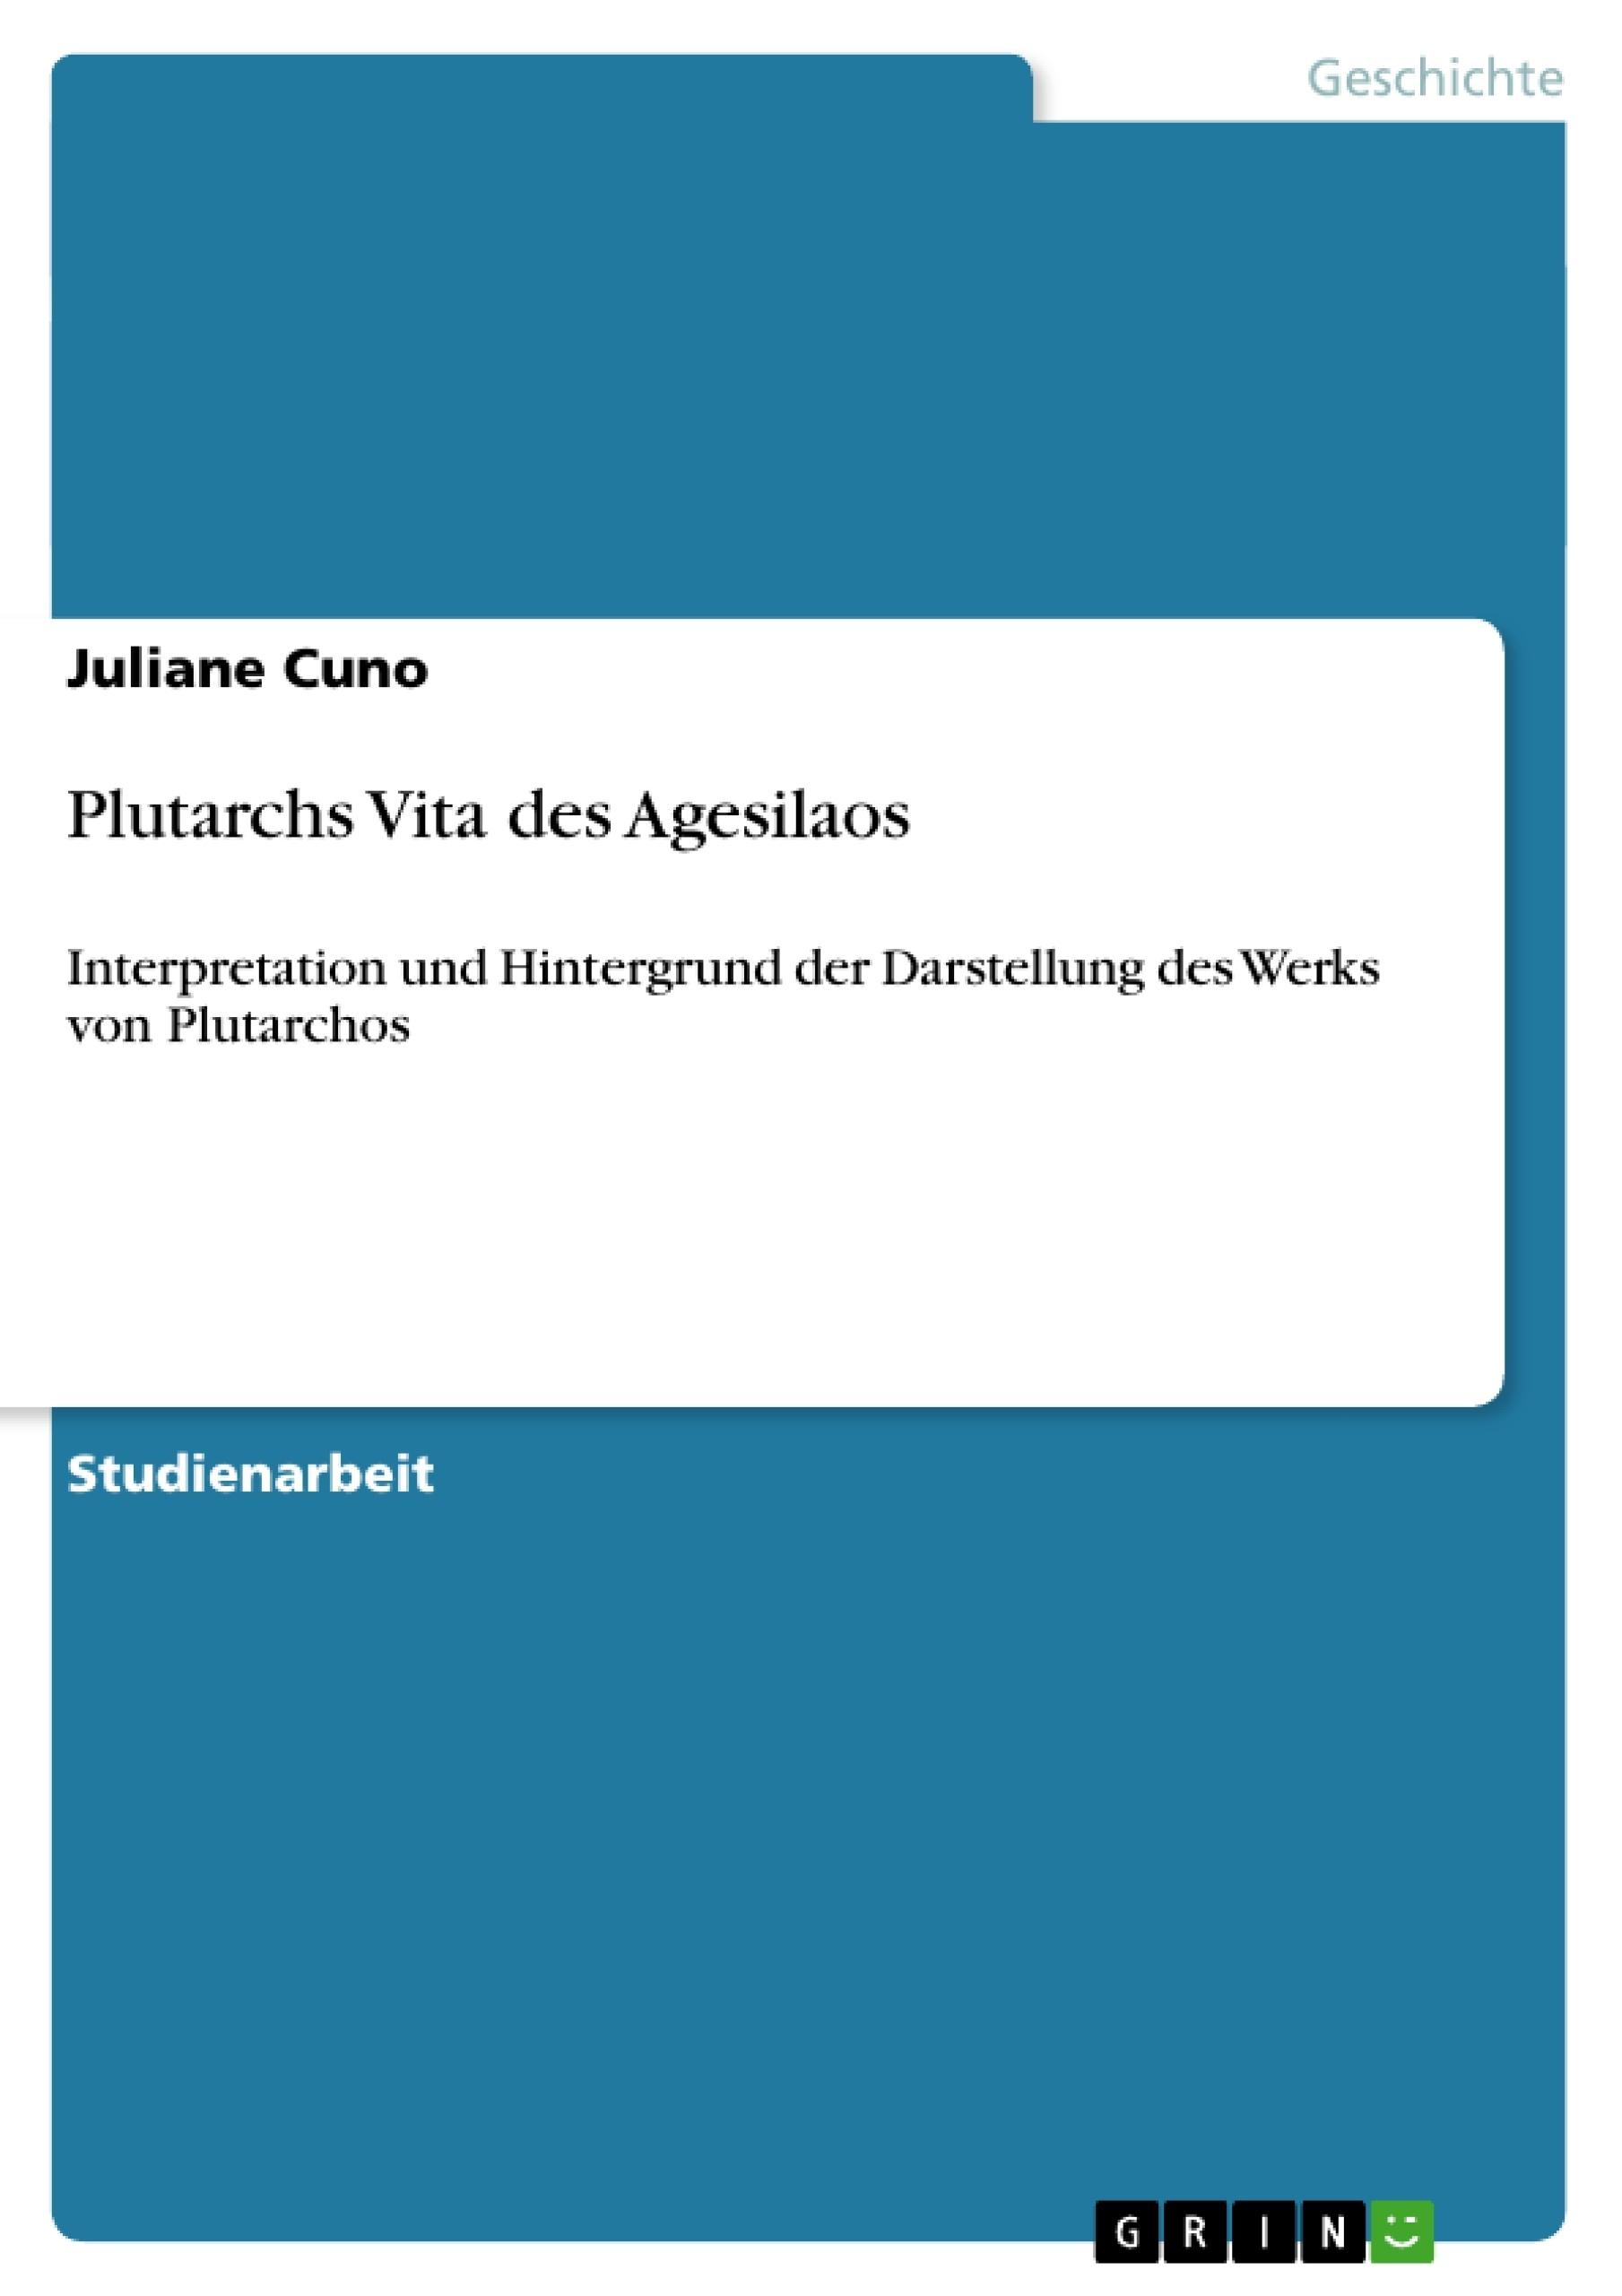 Titel: Plutarchs Vita des Agesilaos